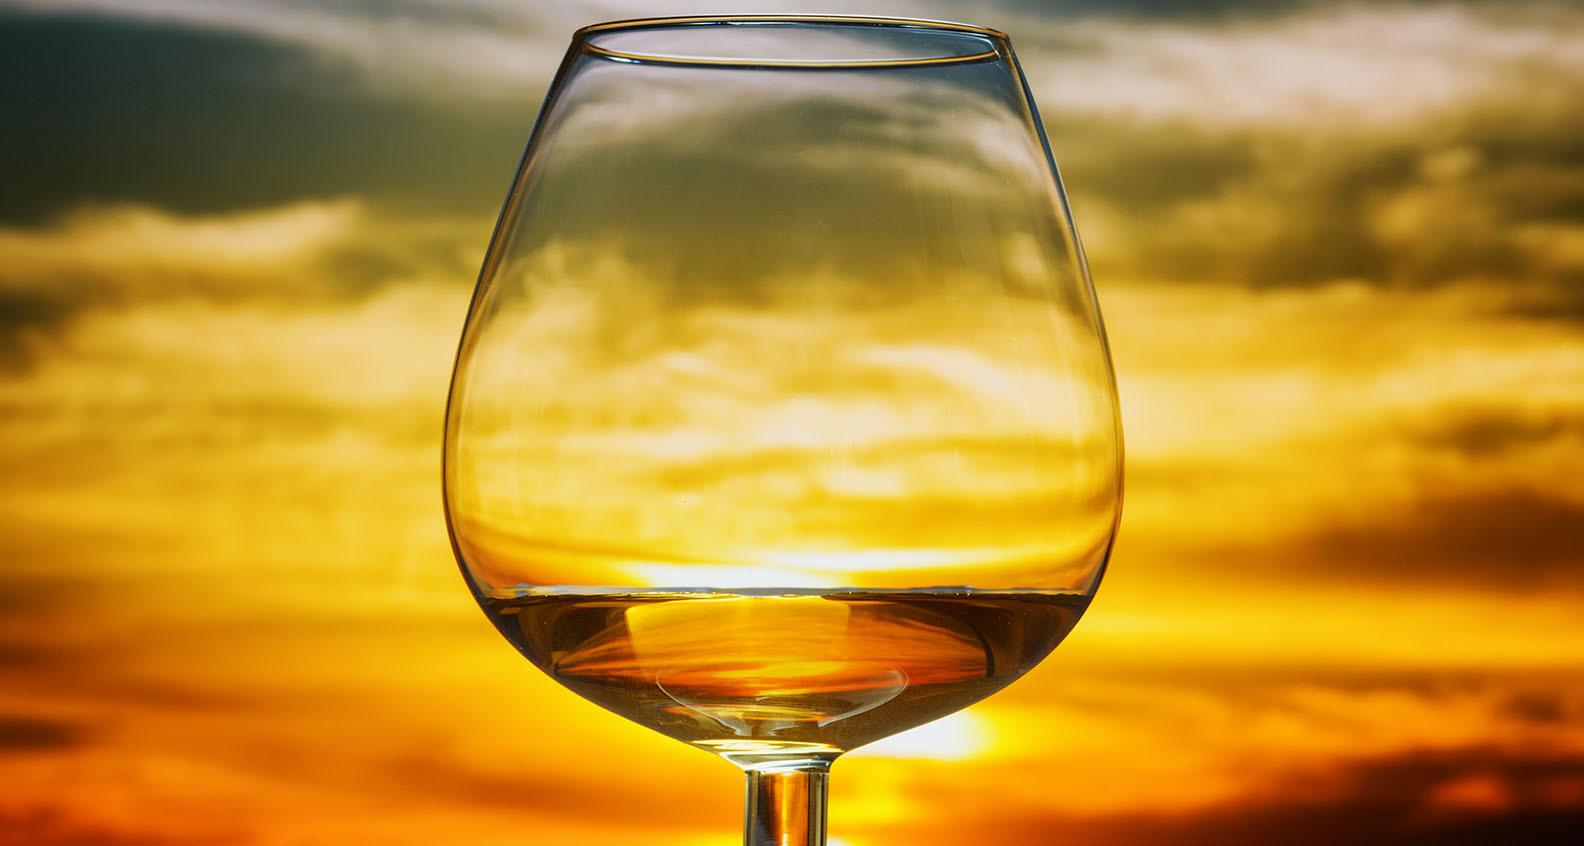 Southern brandy hero credit jan gourley